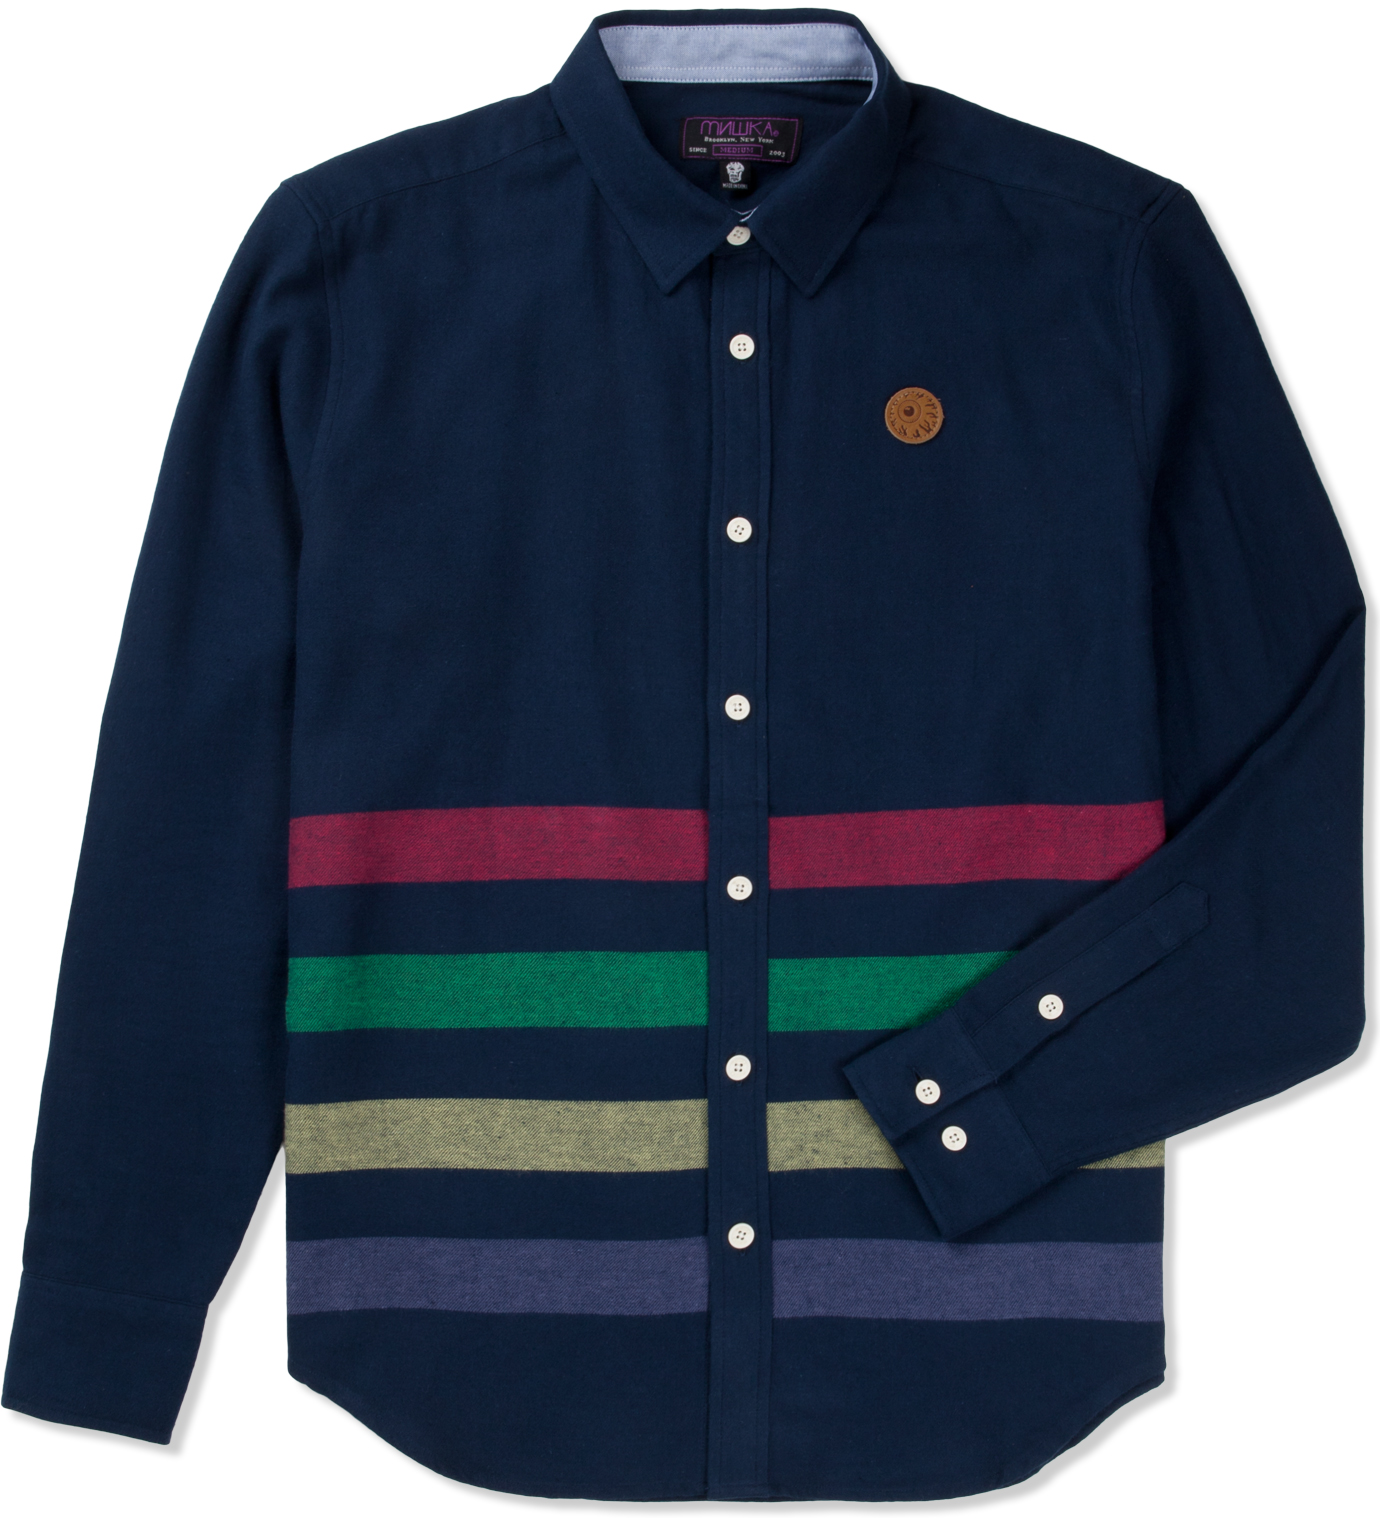 Mishka navy broadway button up flannel shirt hbx for Button up flannel shirts